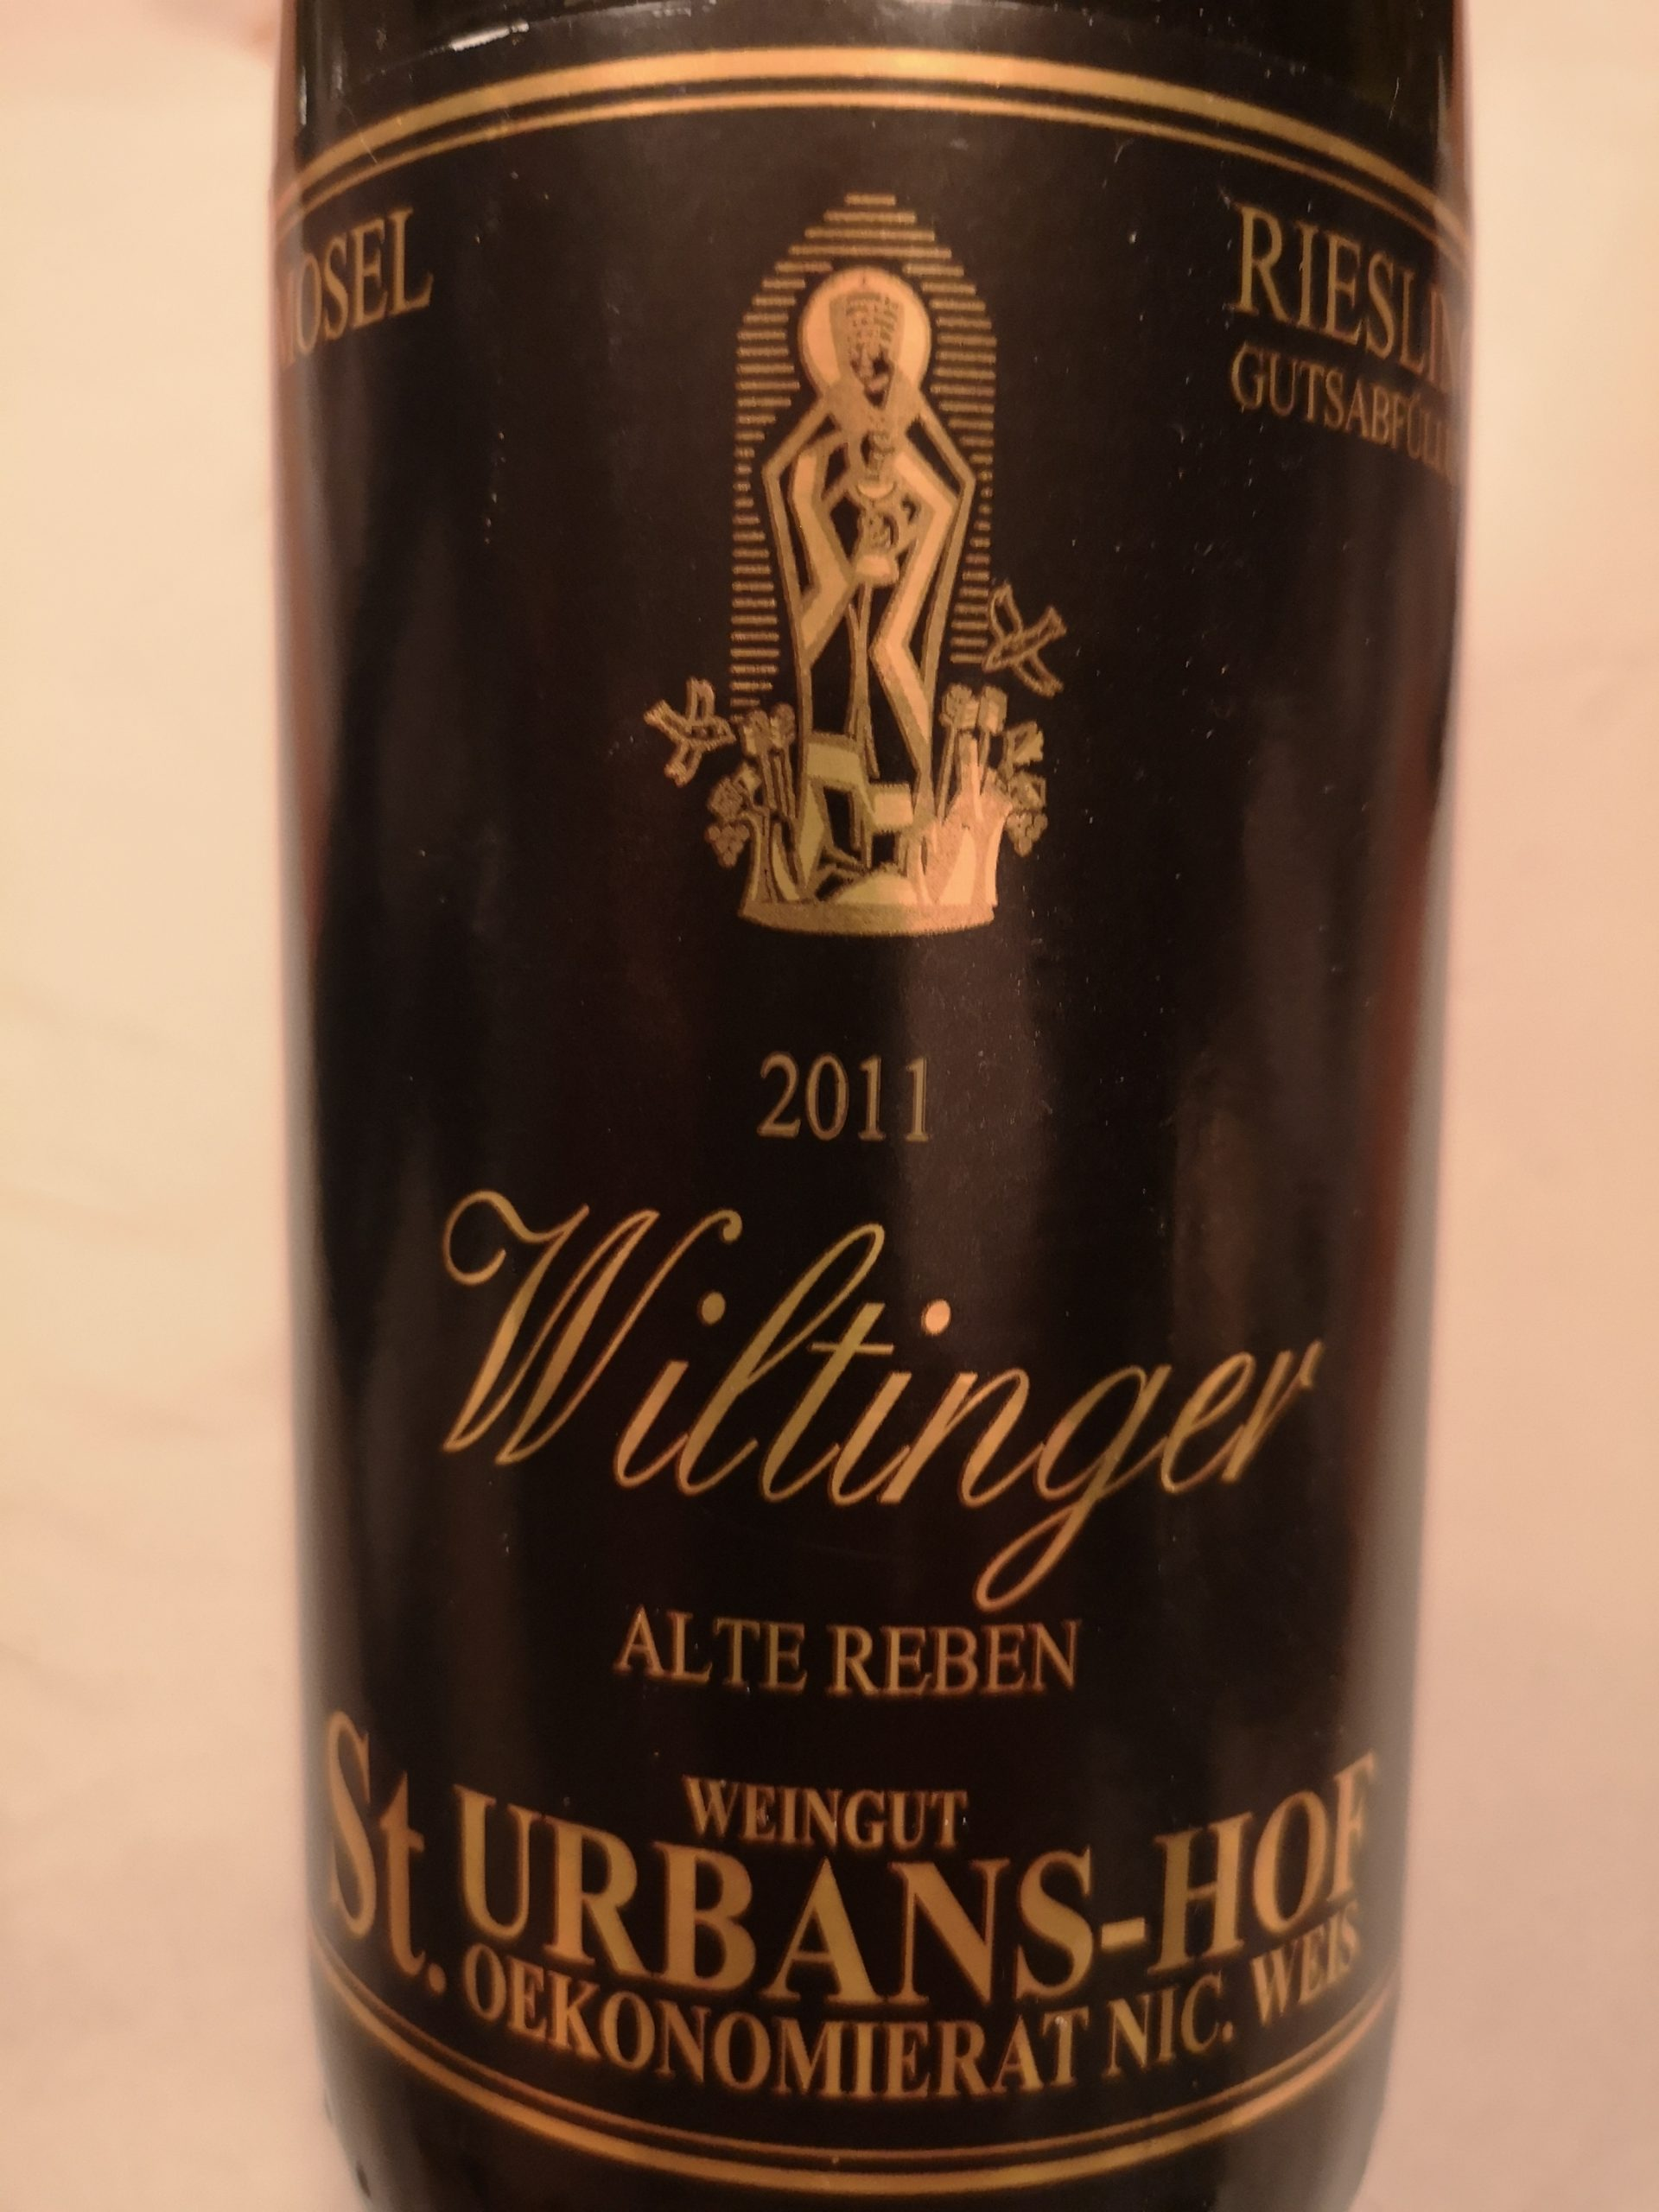 2011 Riesling Wiltinger Alte Reben | St.-Urbans-Hof